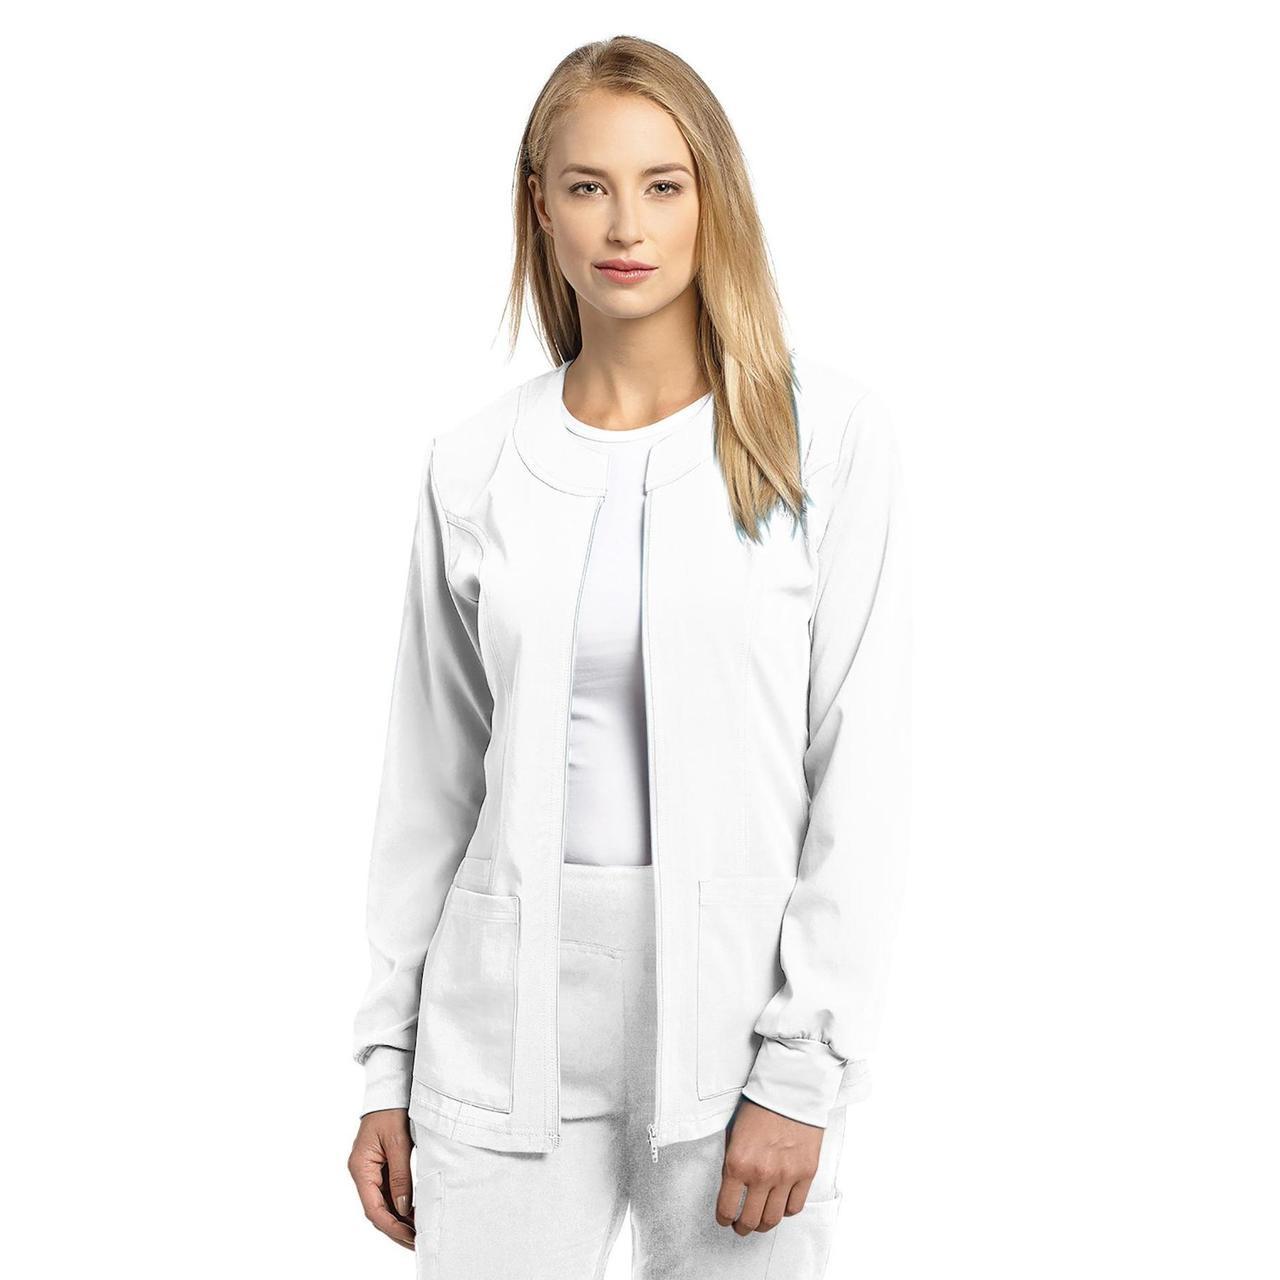 b57fcbb523e Marvella Jacket by White Cross - Everything Uniforms